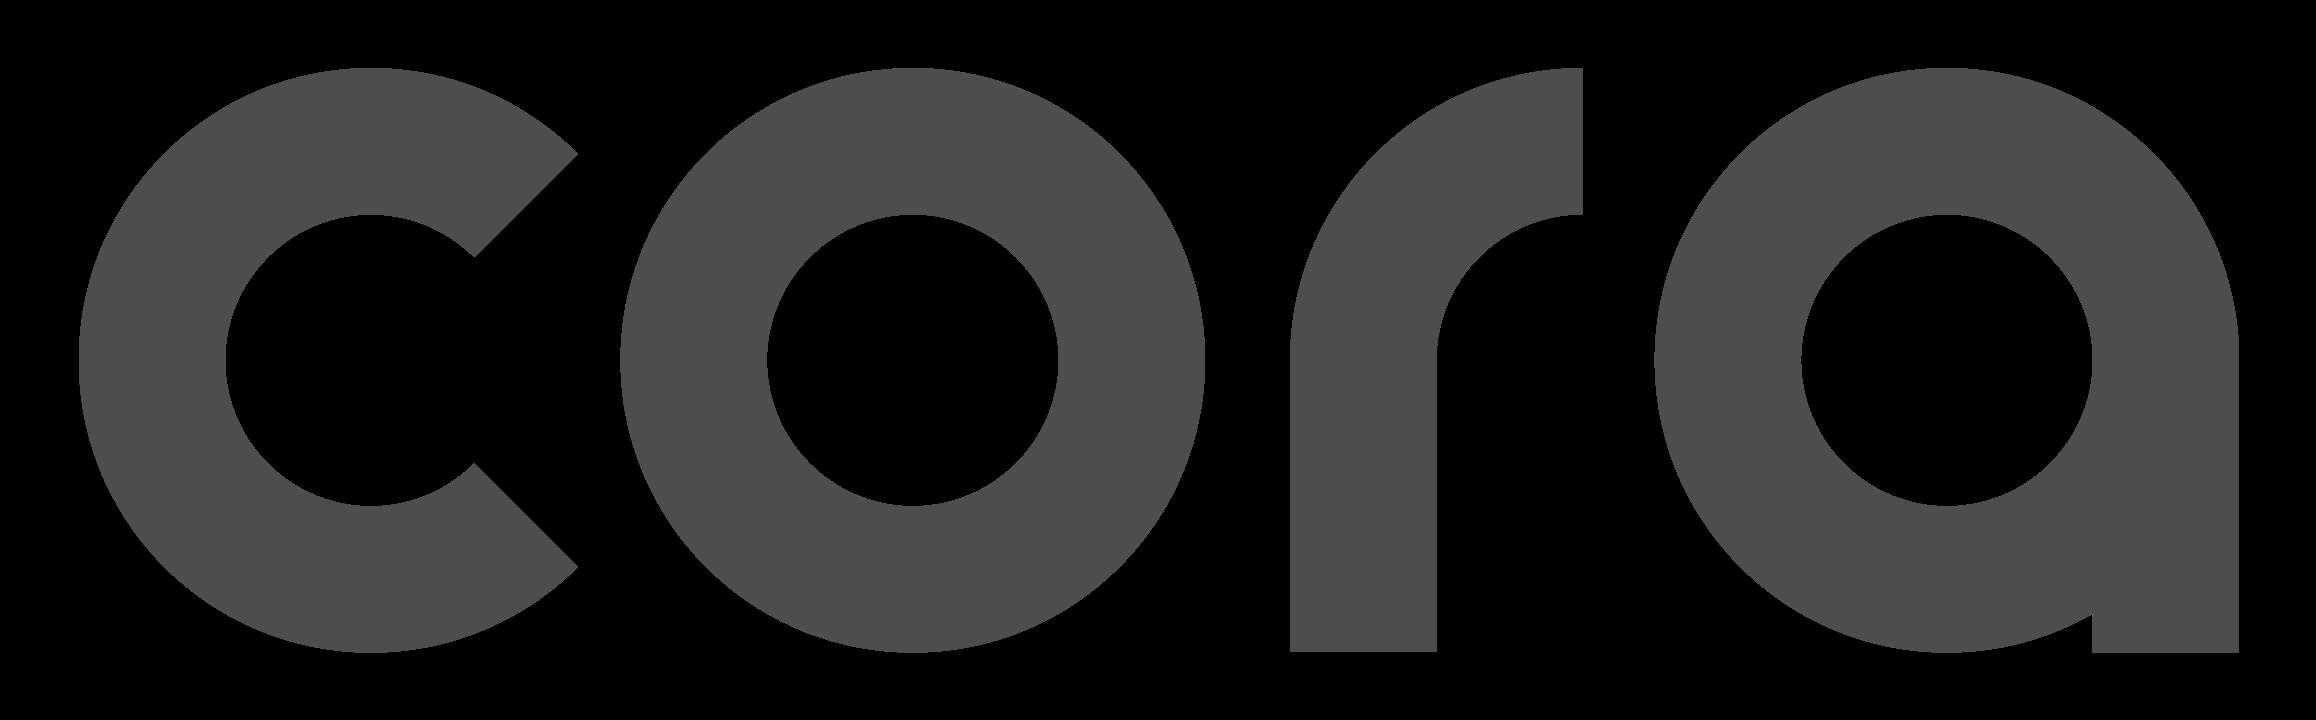 Cora Aero logo